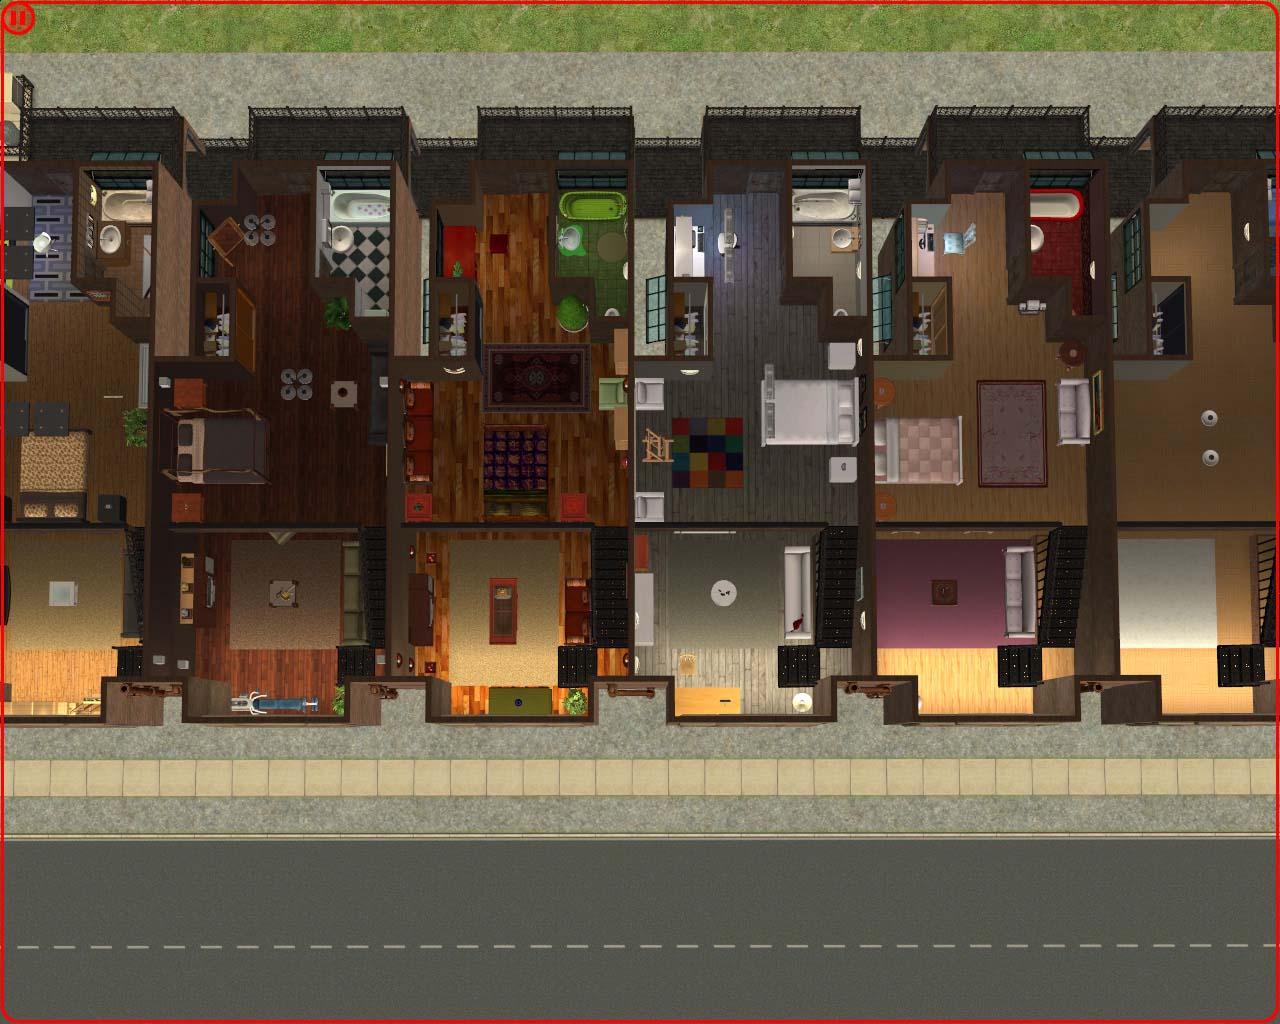 Mod The Sims Corrington Mill Converted Warehouse Apartments